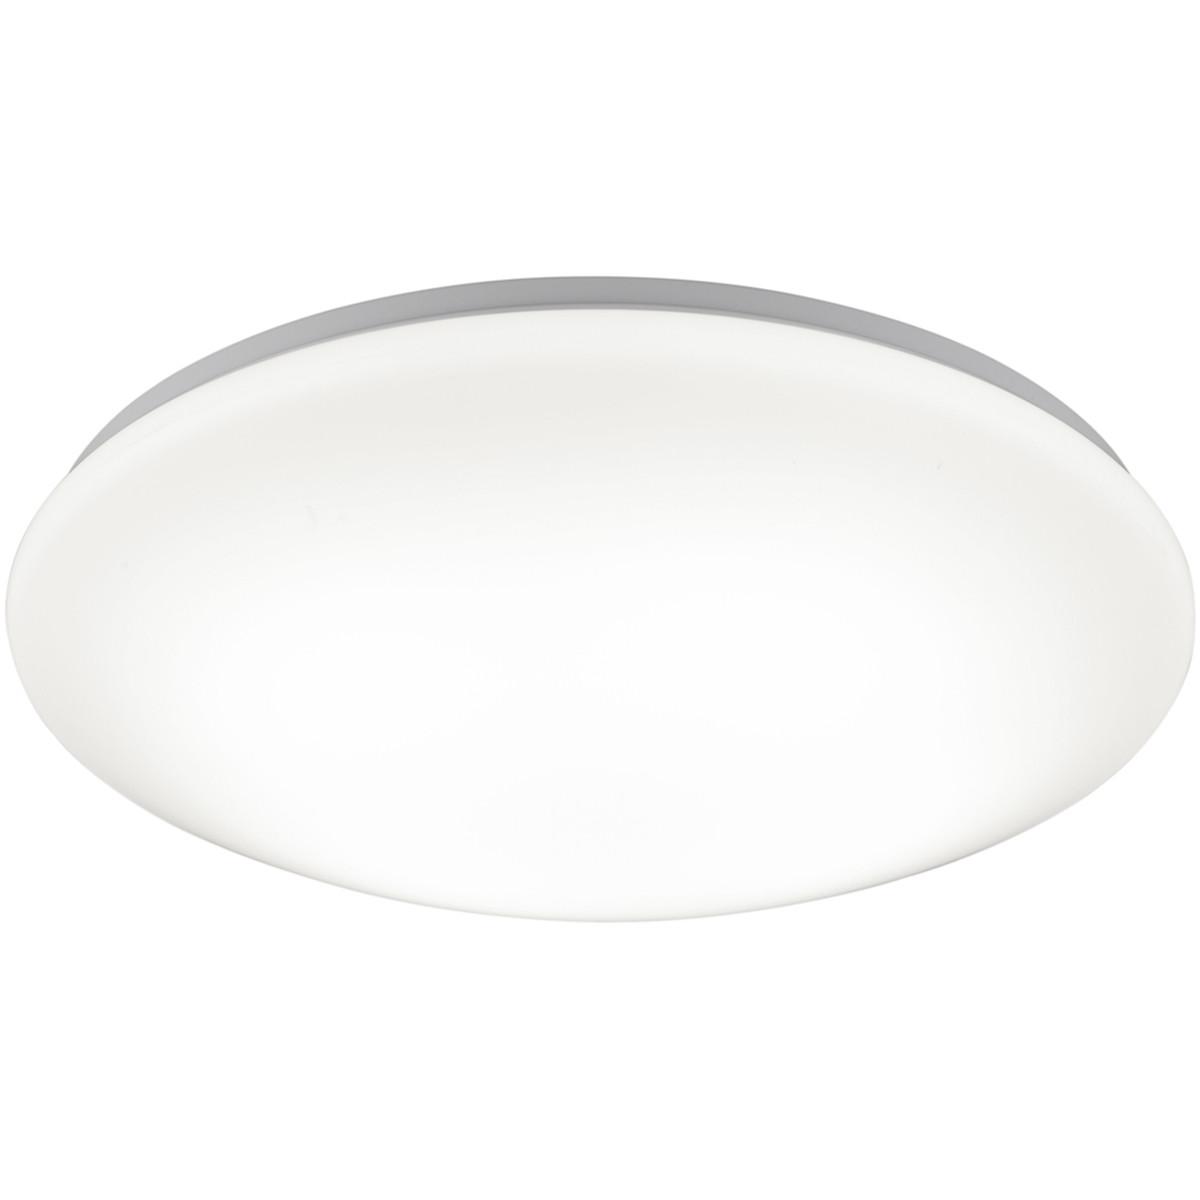 LED Plafondlamp - Trion Conviton - Opbouw Rond 21W - Warm Wit 3000K - Dimbaar - Mat Wit - Acryl